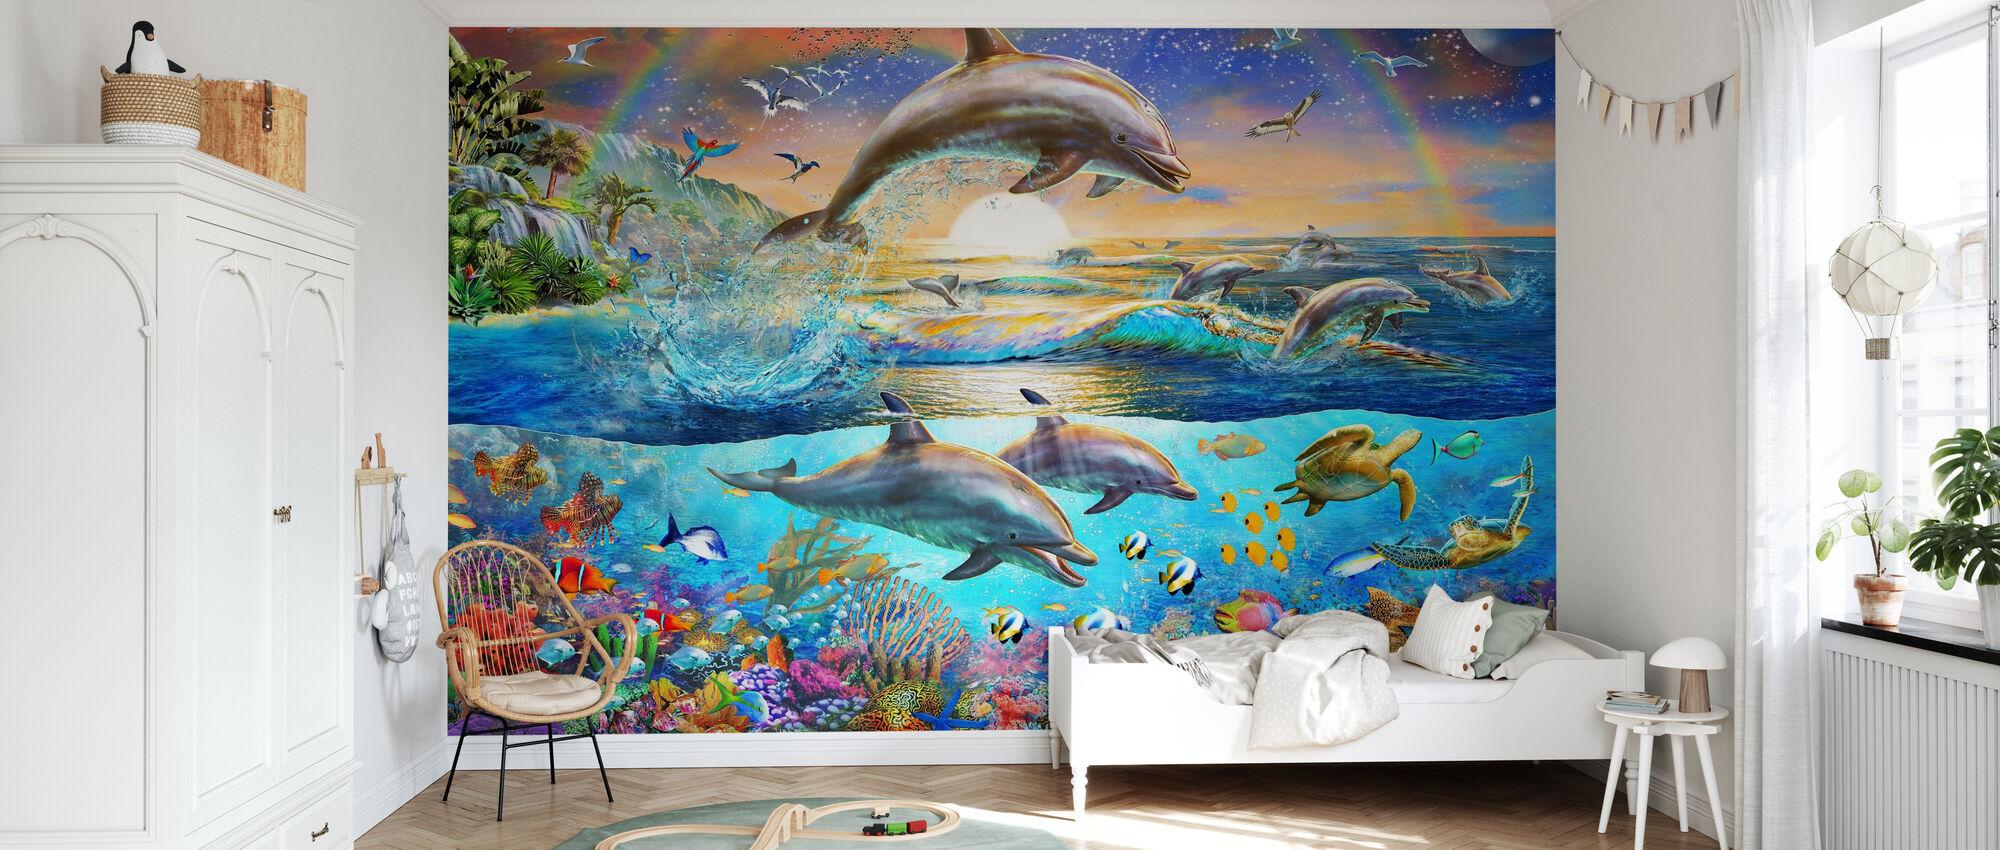 Dolphin Treasure - Wallpaper - Kids Room